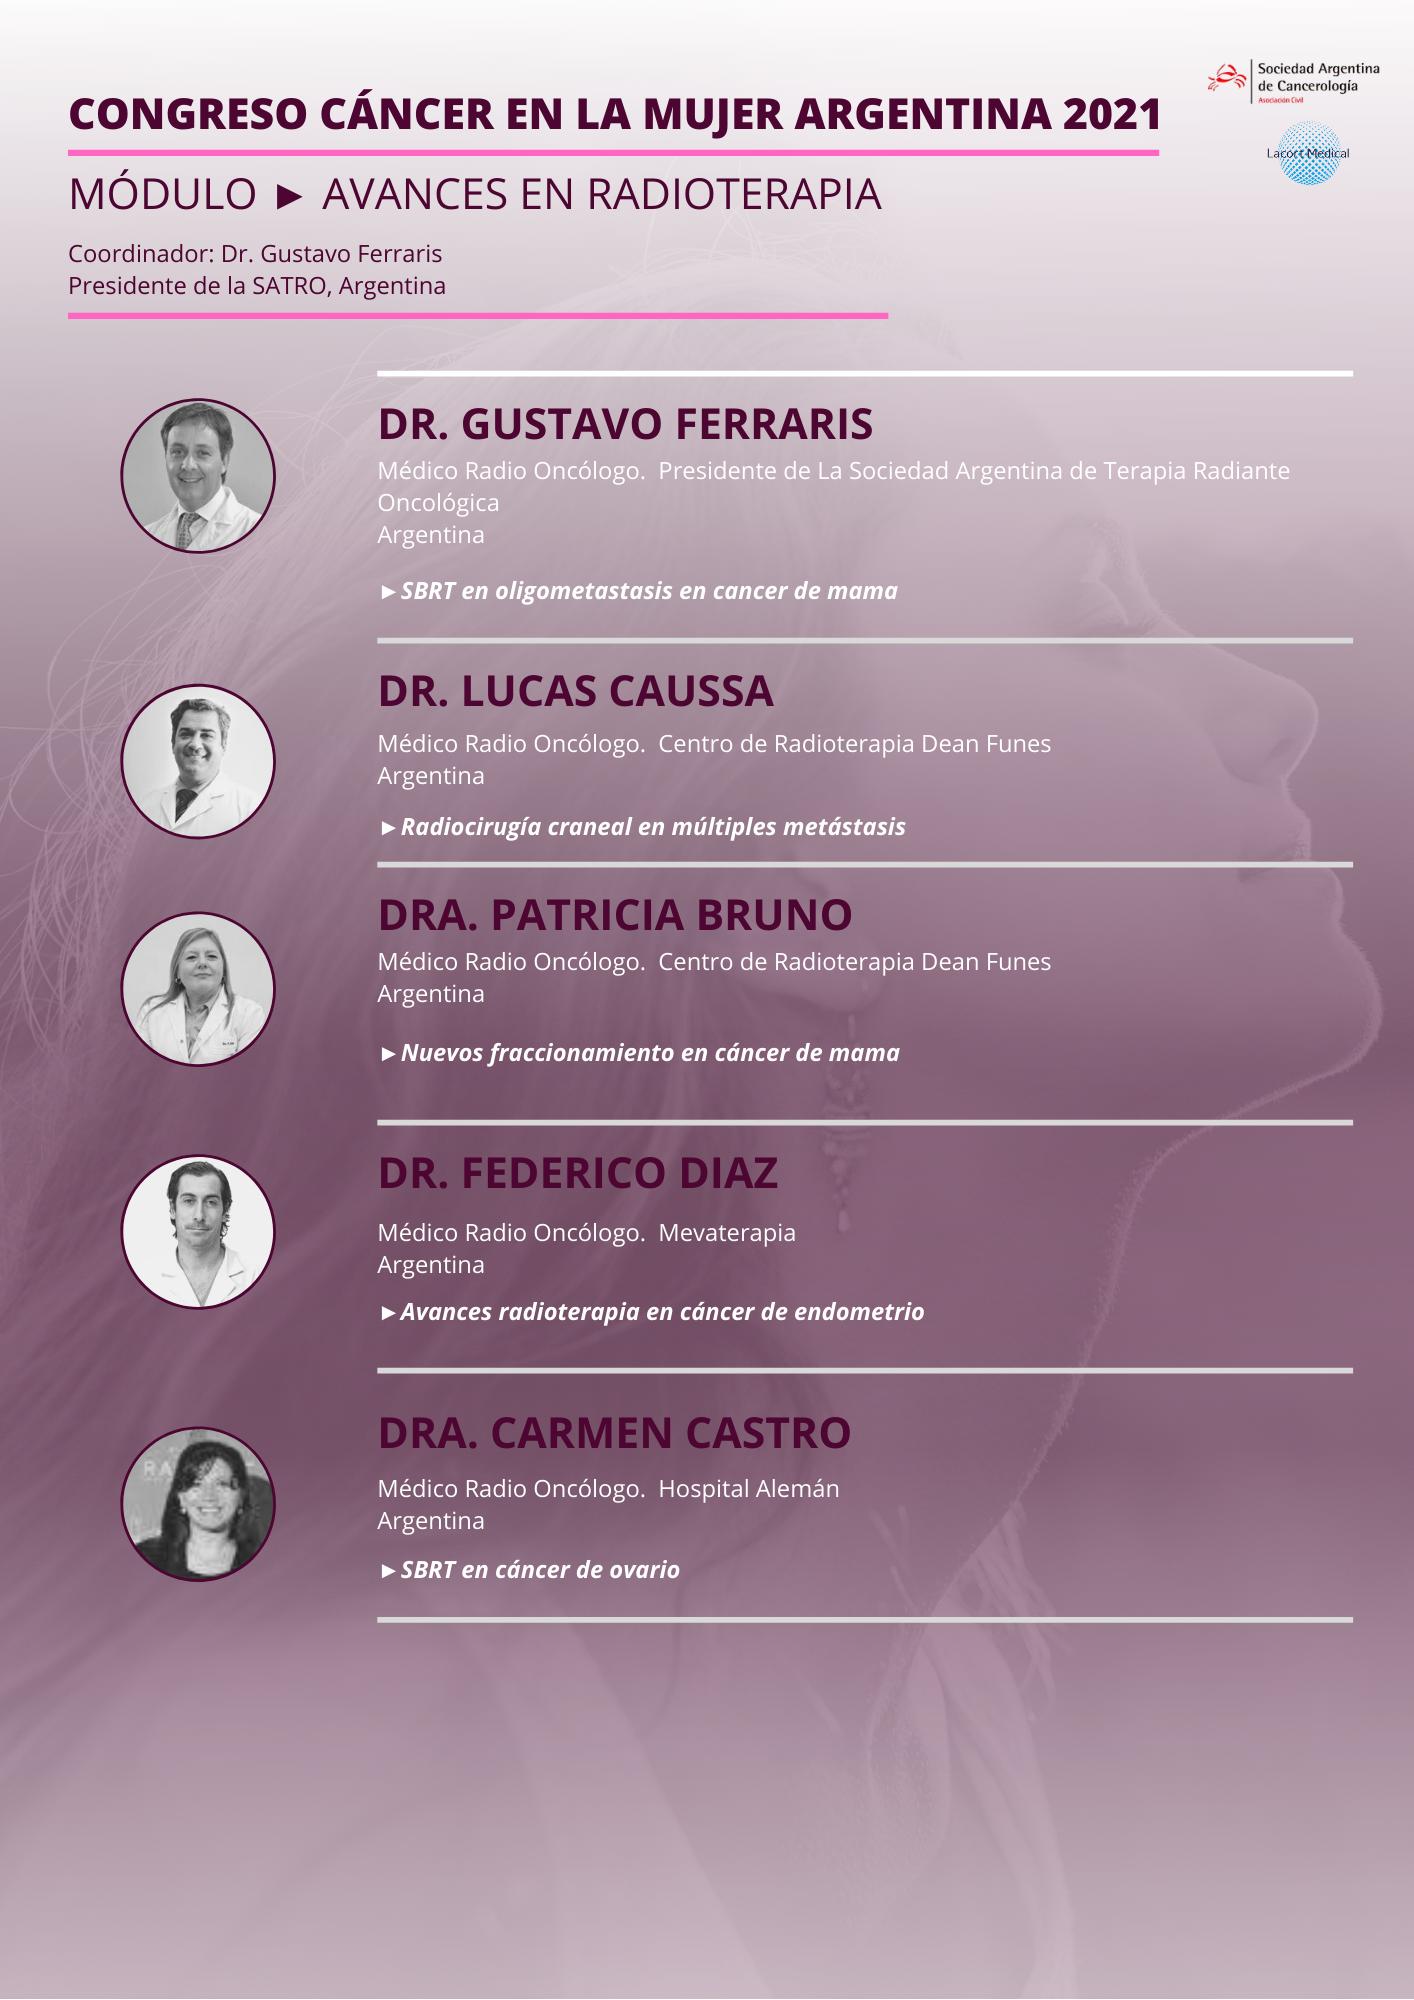 AGENDA ACADEMICA ARGENTINA 2021 (8).png